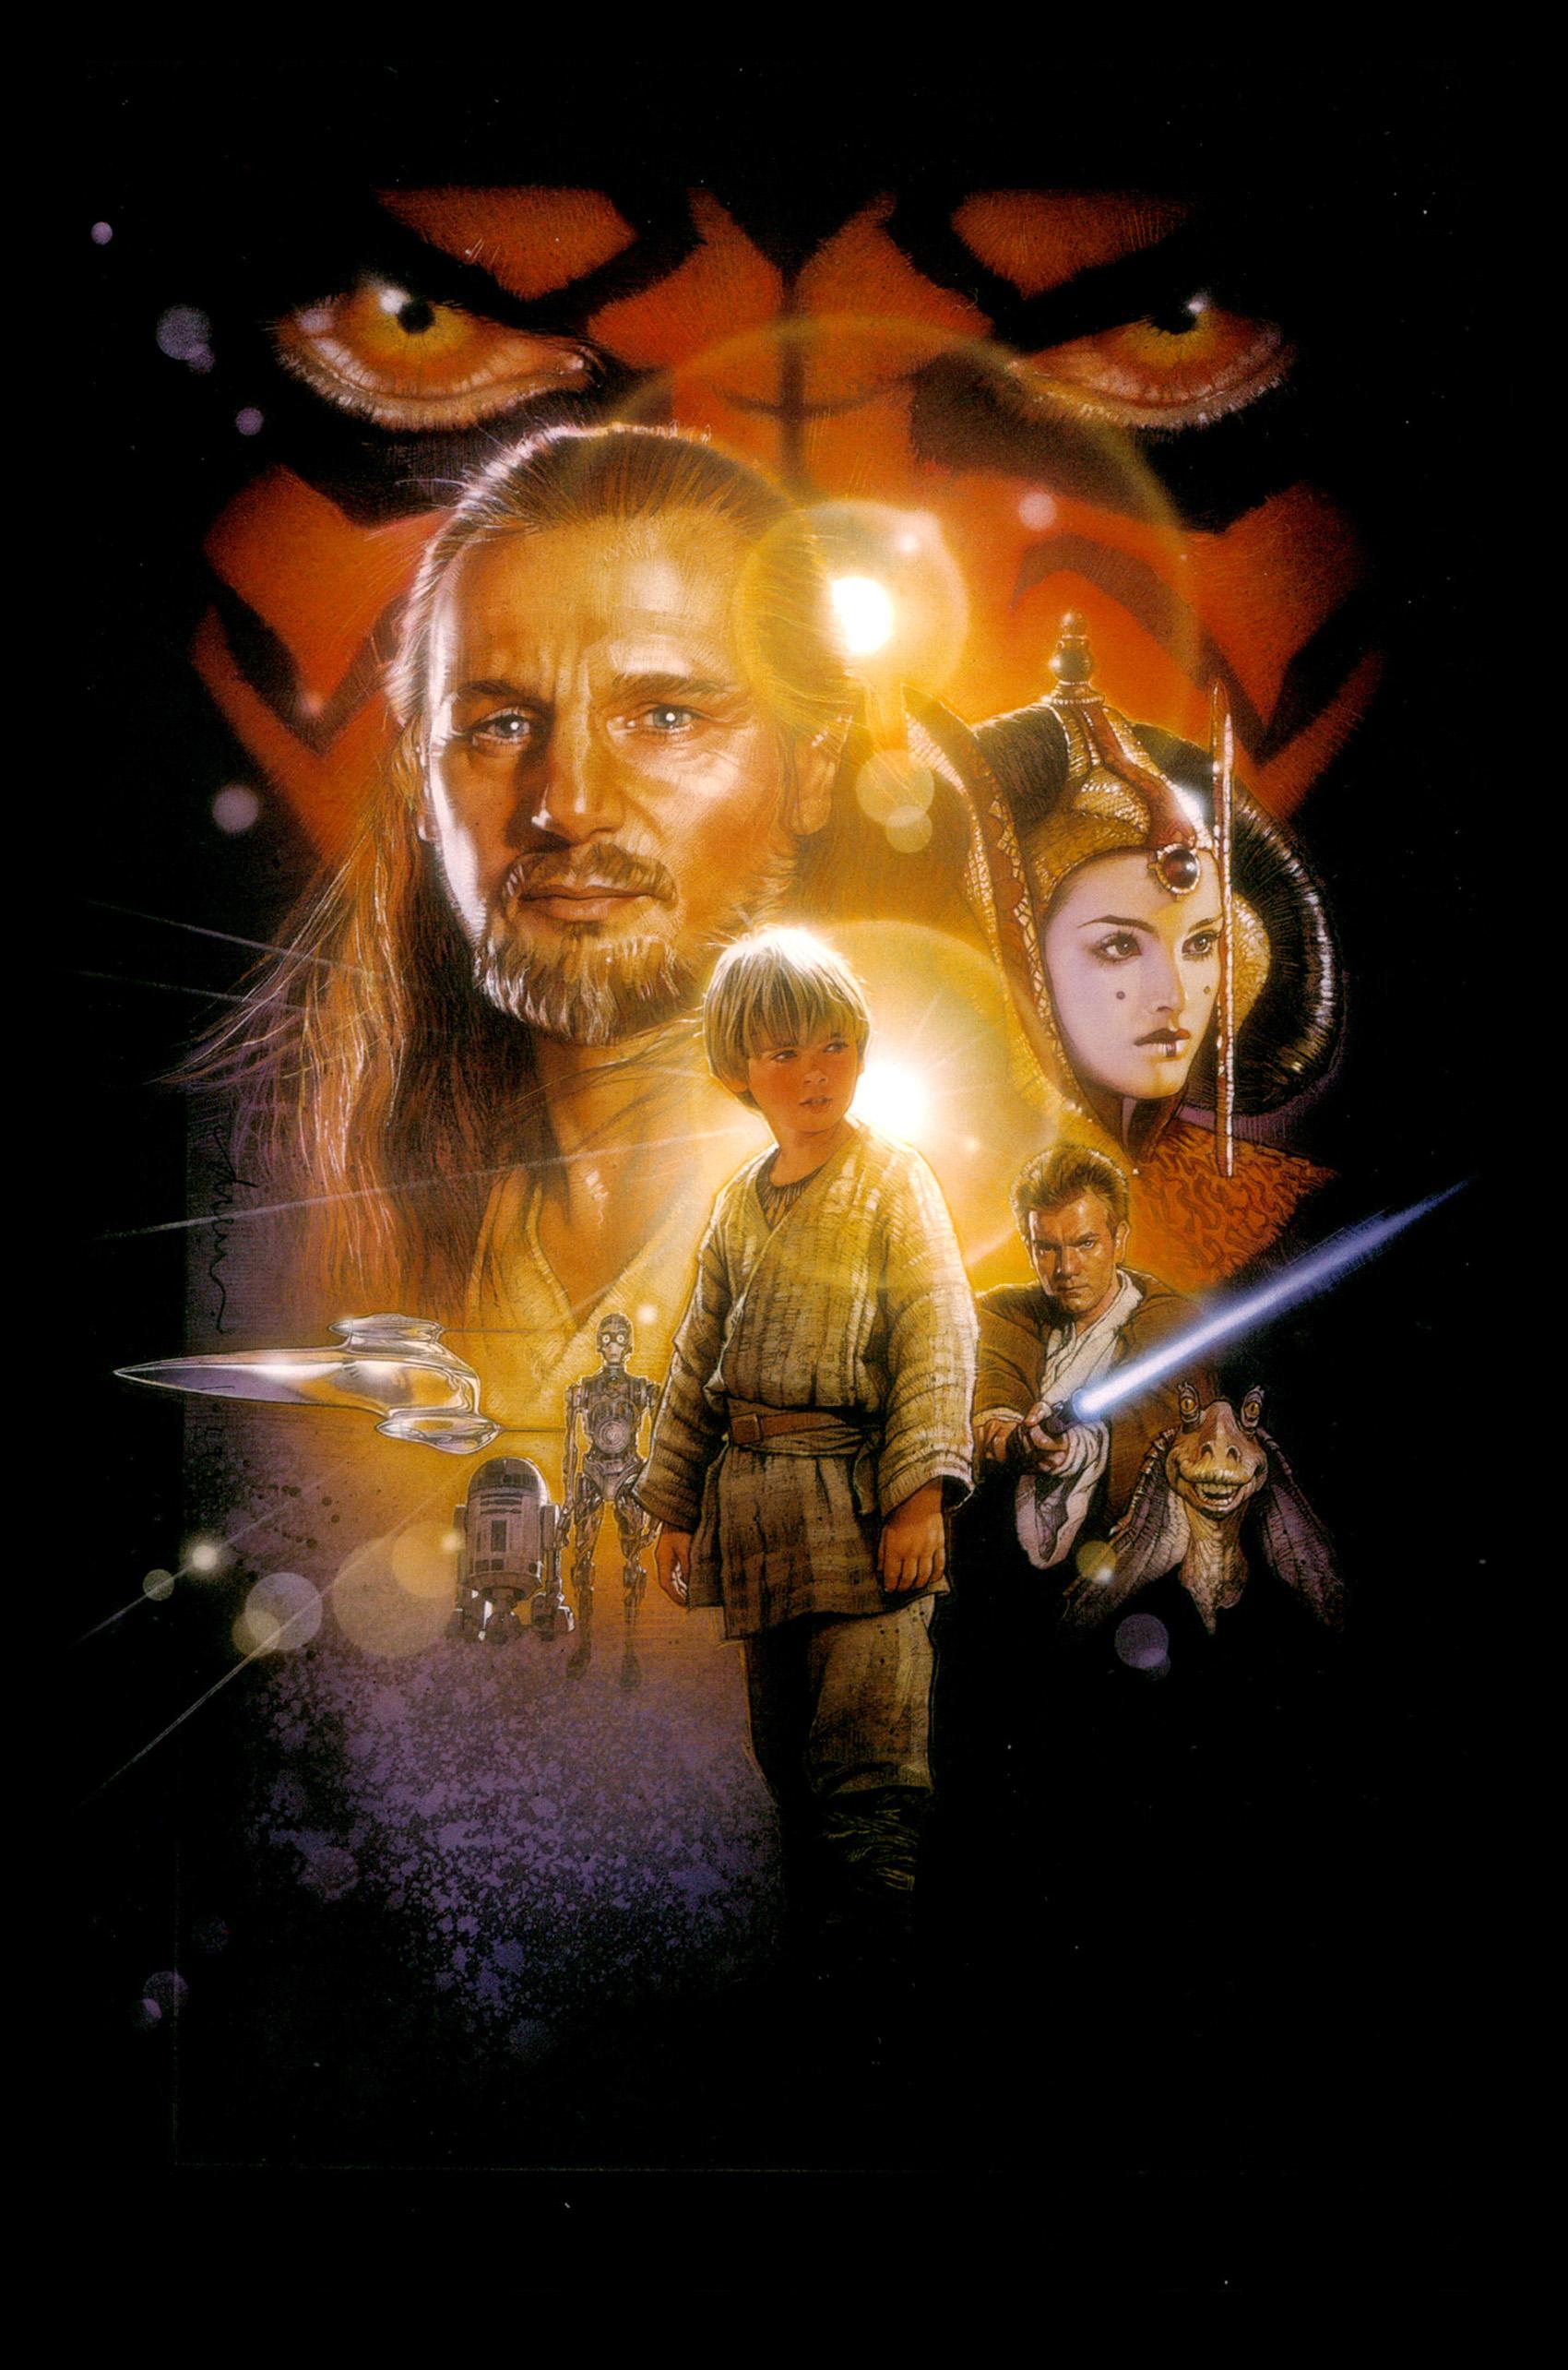 Star Wars, Ep. I La Amenaza Fantasma (1999) - George Lucas